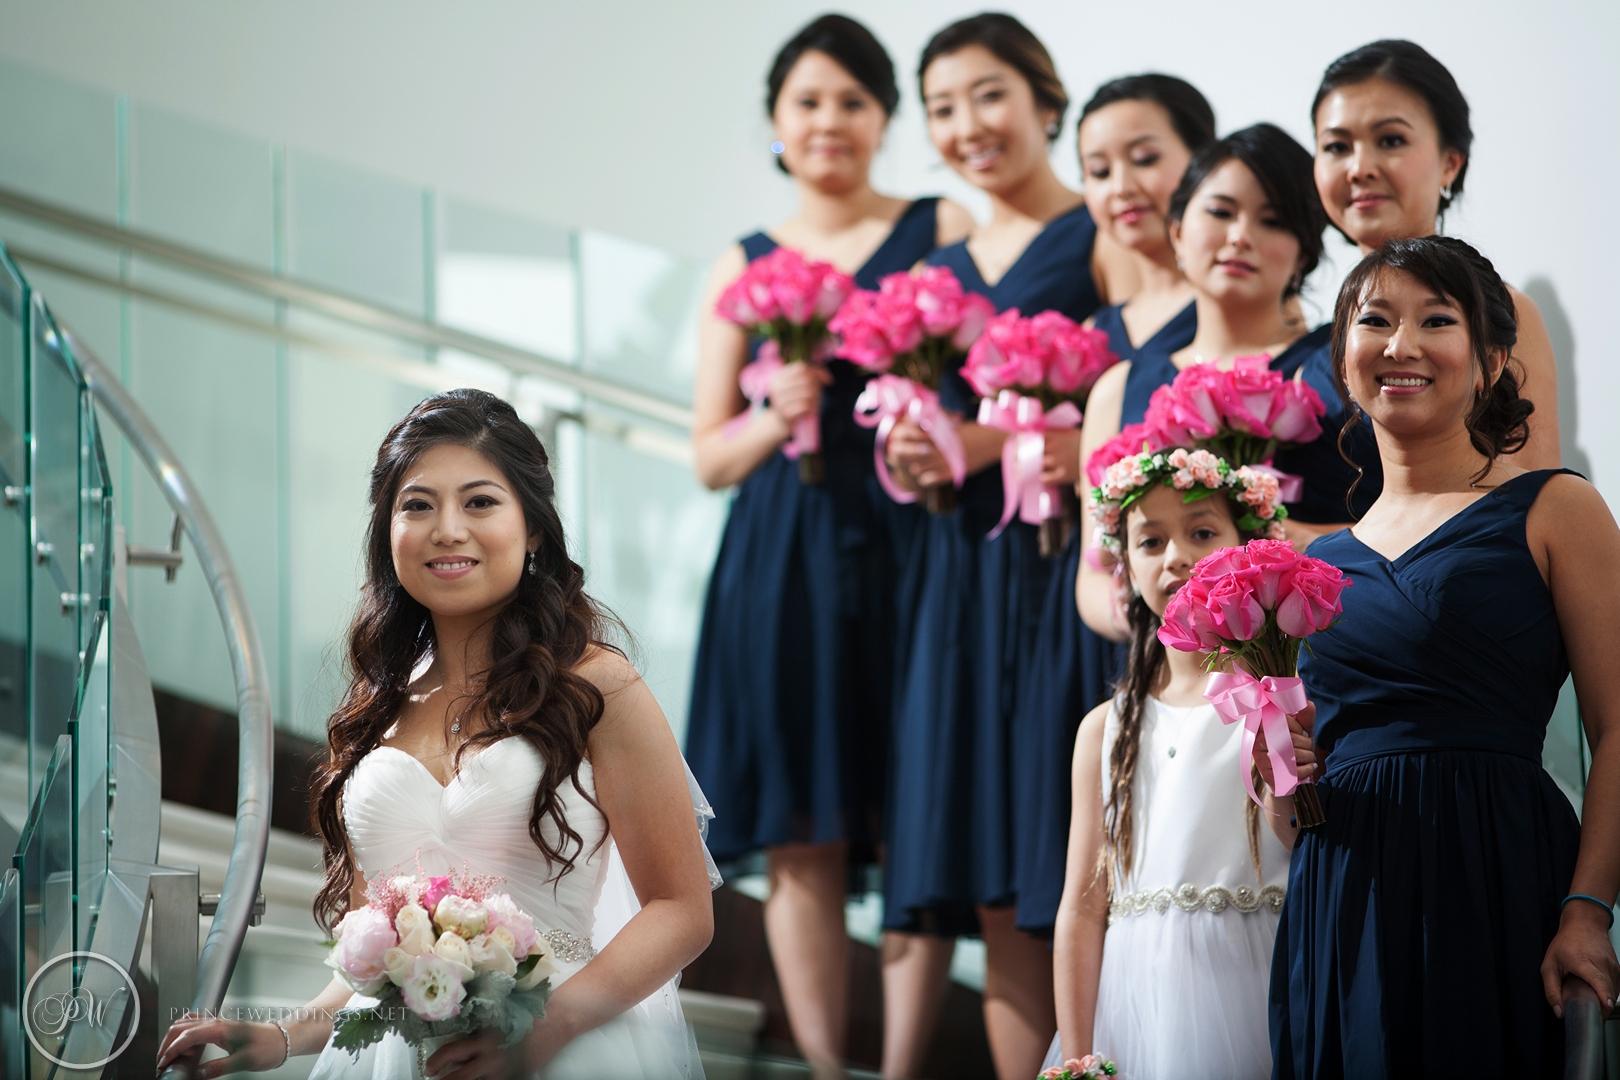 Castaway_Burbank_Wedding_Photo_Christian_Autumn017.jpg